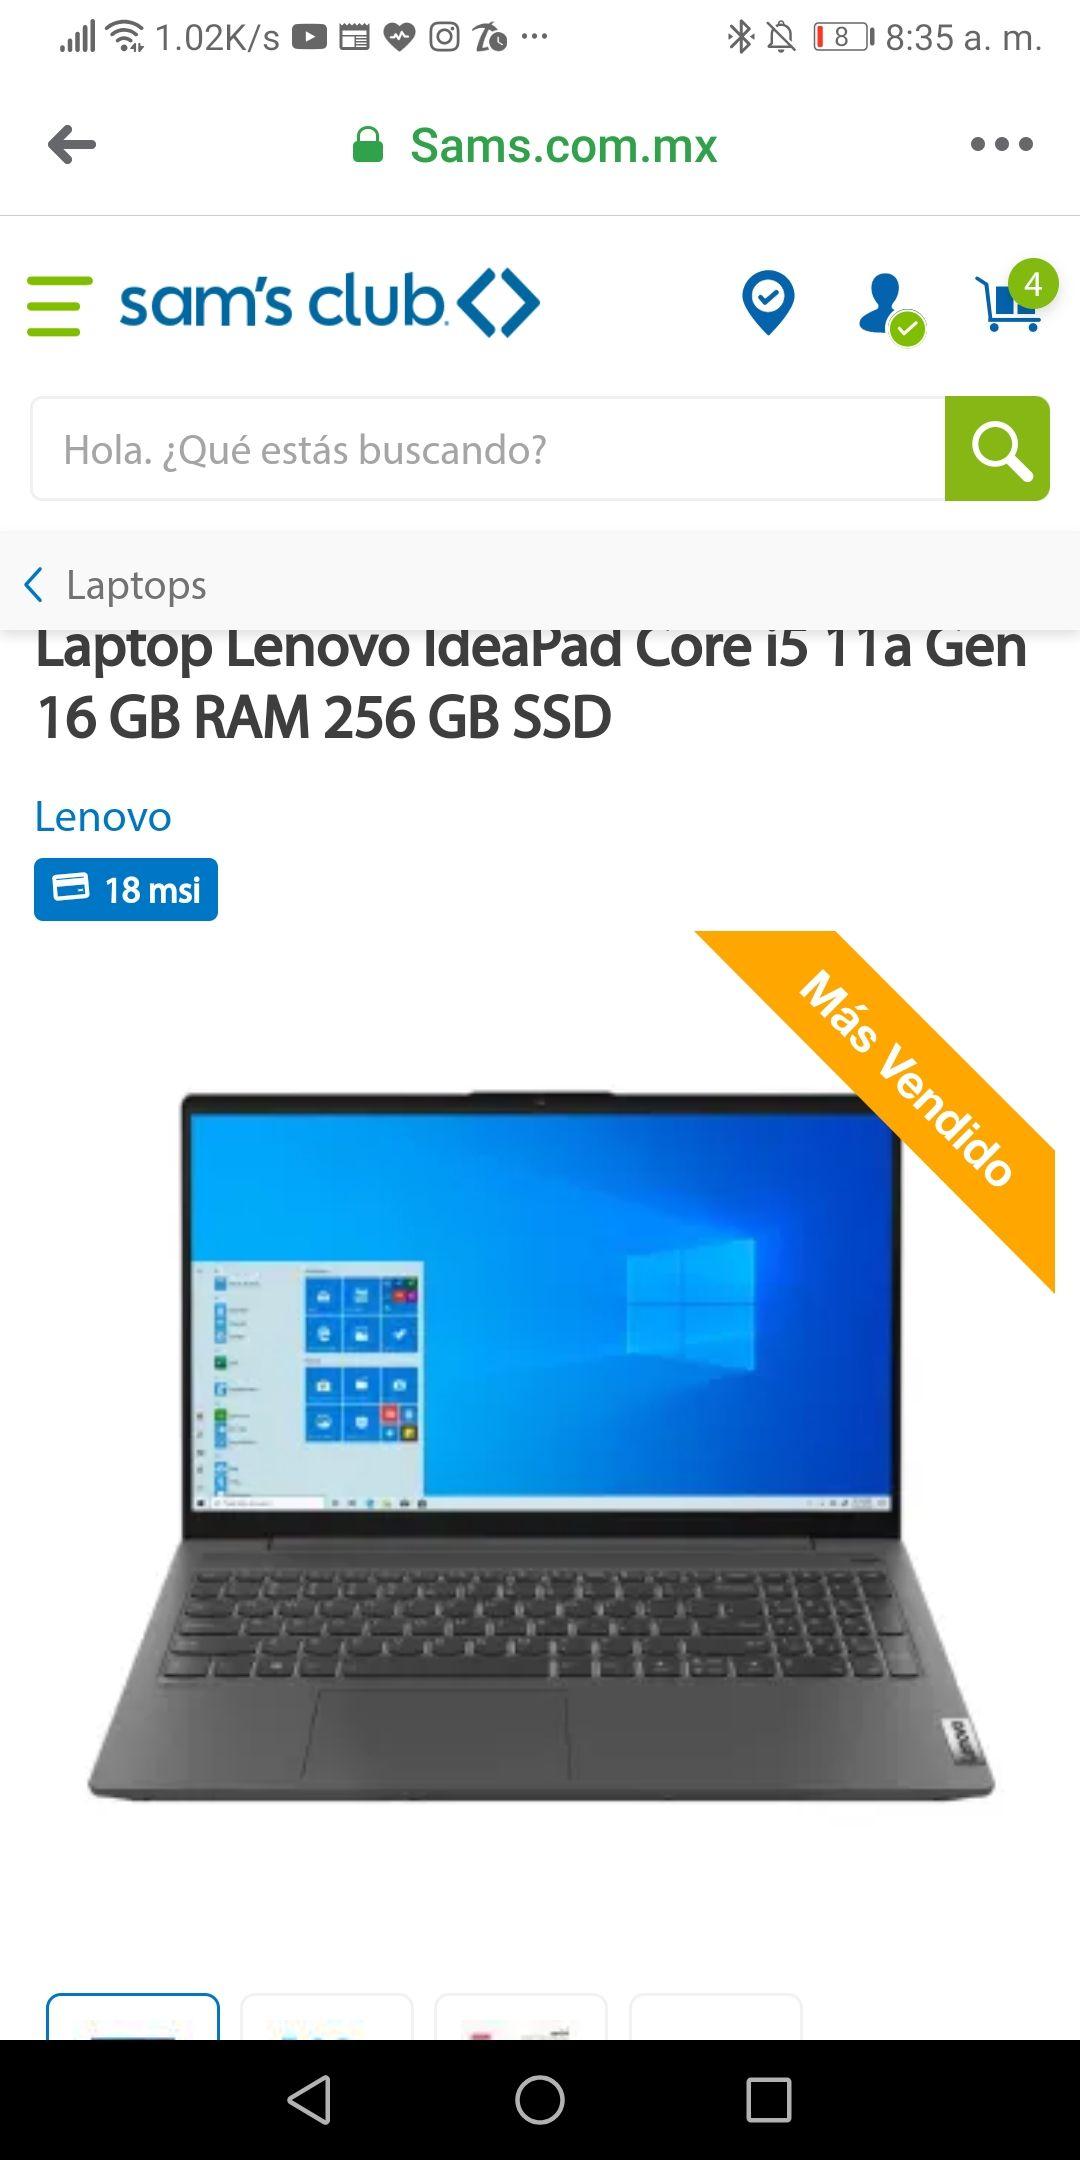 Sam's Club Lenovo ideapad i5 11va Gen geforce mx450